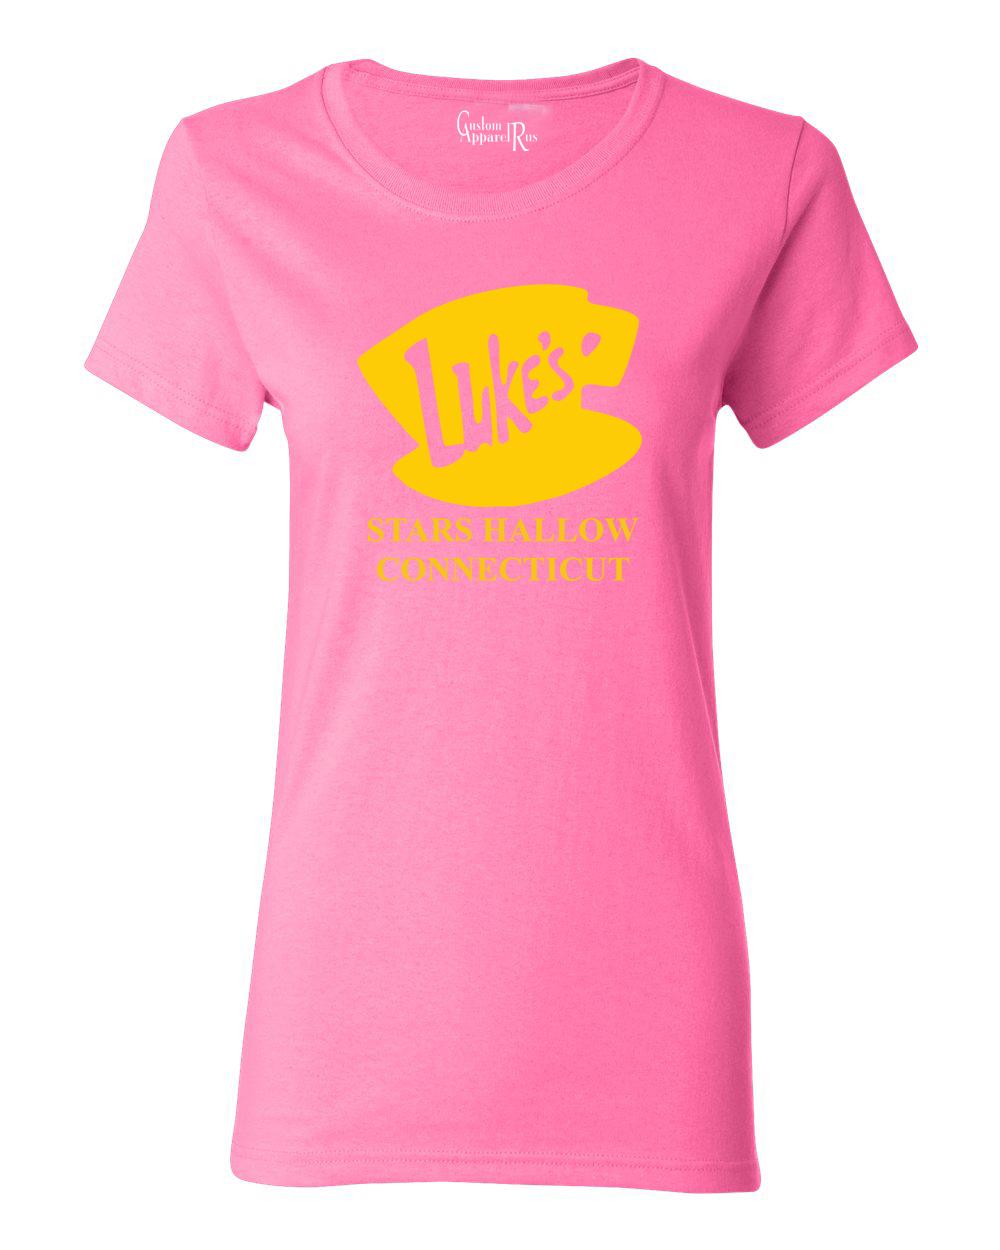 Luke's Diner Stars Hollow CT Gilmore Girls Womens T-Shirt Top